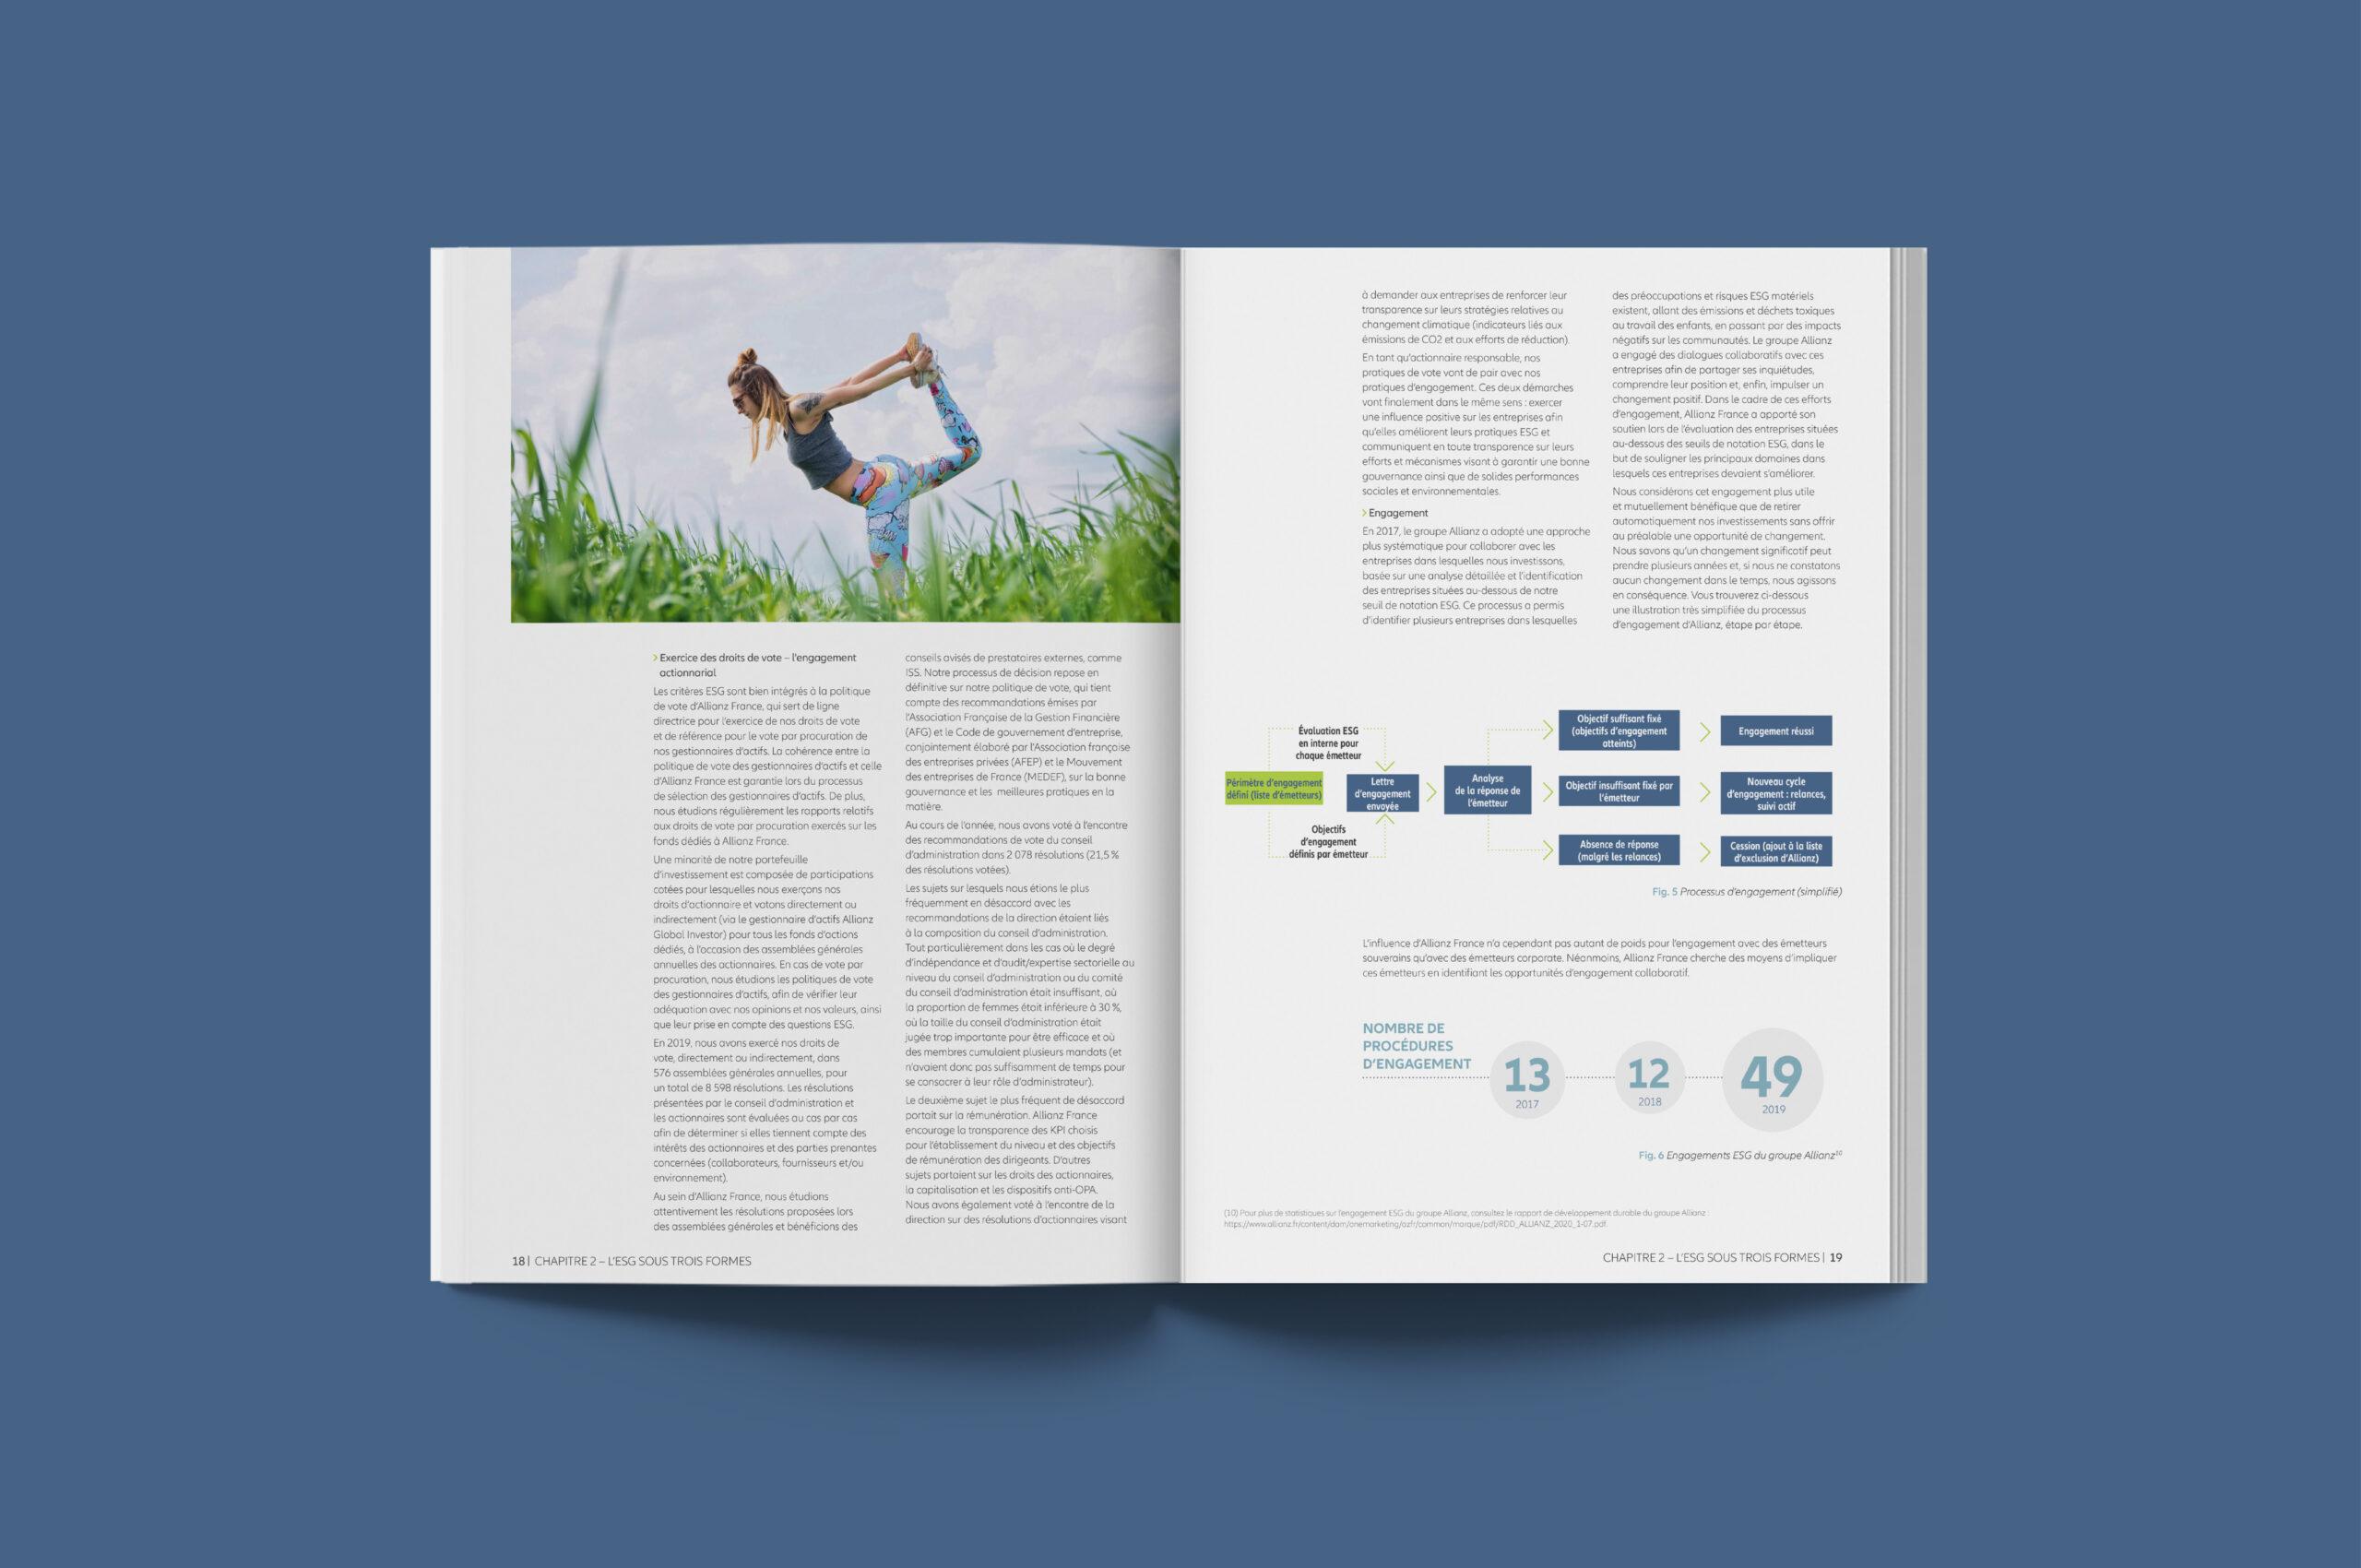 Rapport investissement durable allianz 5